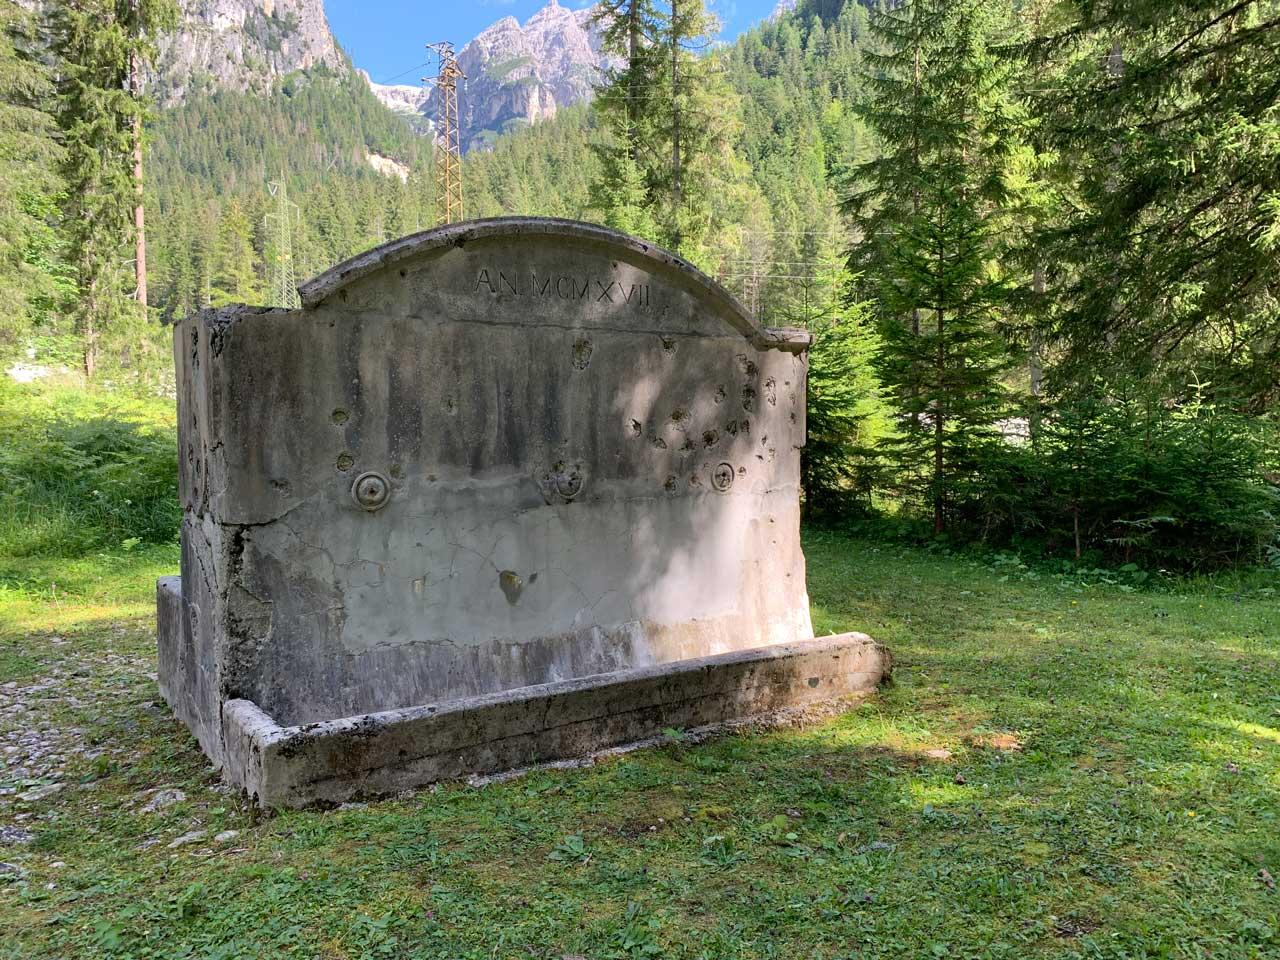 Auronzo-storia-Val-Marzon-fontana-Cason-de-la-Crosera